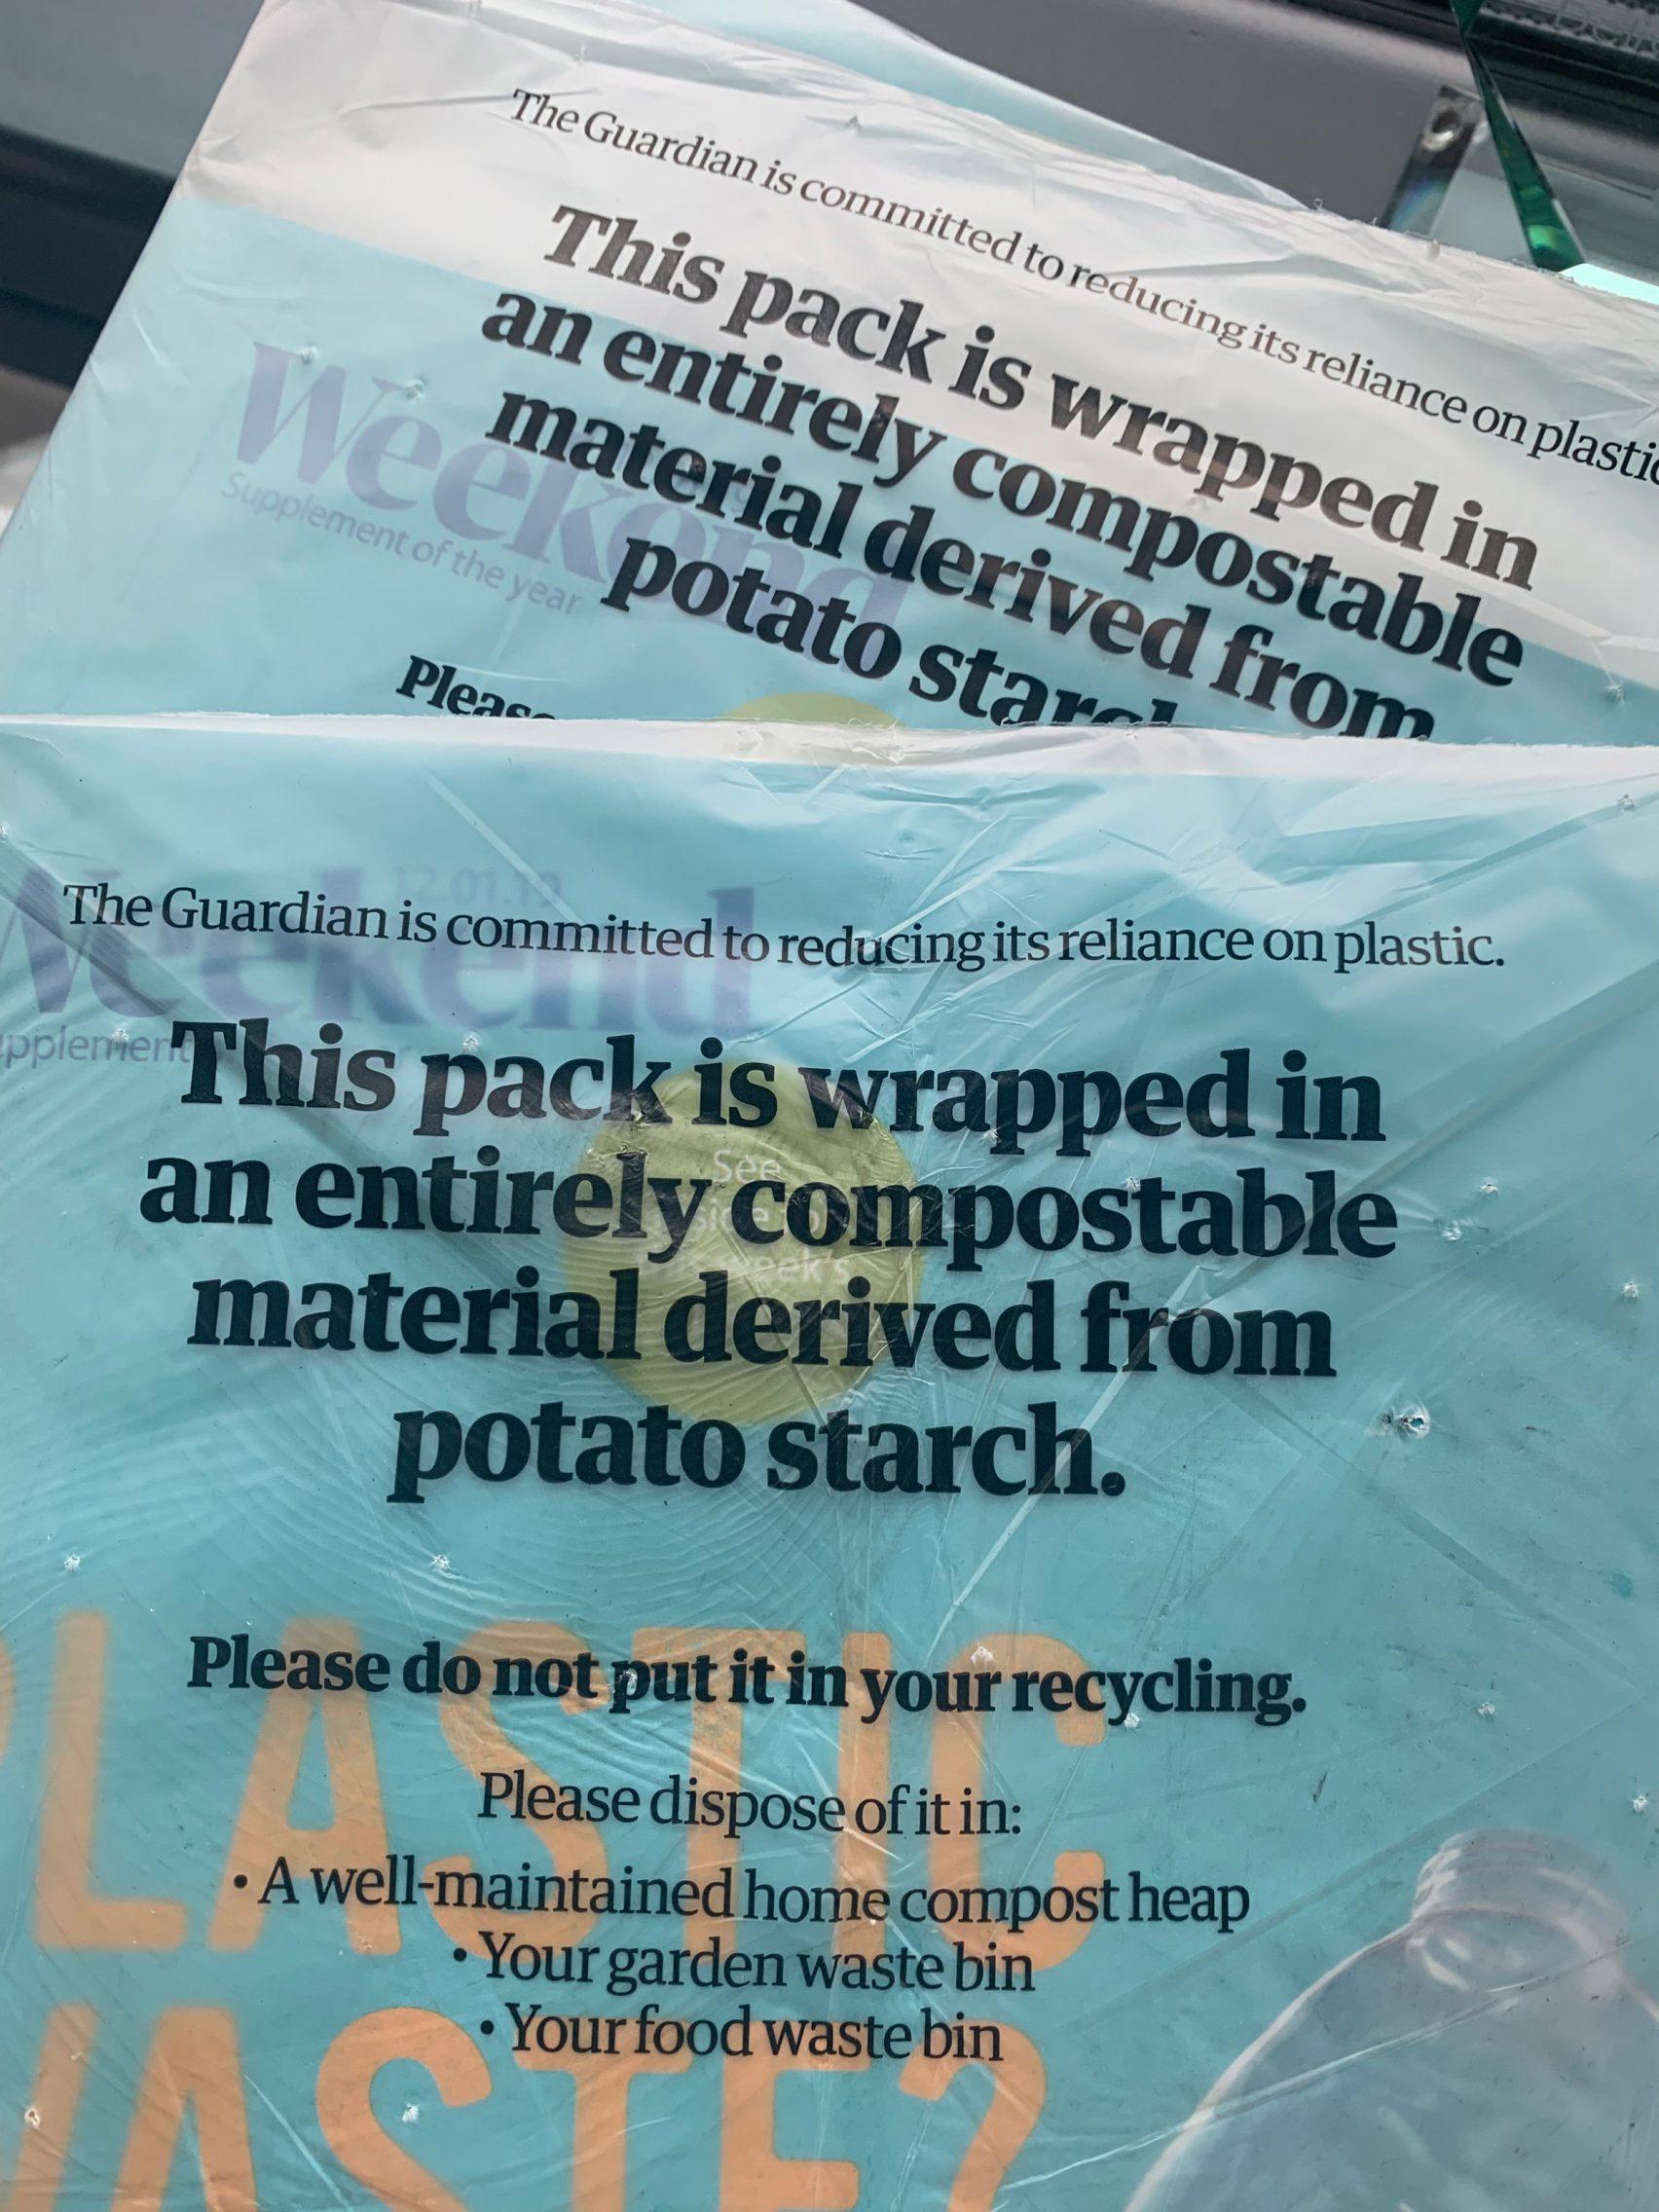 https://static.dezeen.com/uploads/2019/01/guardian-bioplastic-wrapping-design-col-1-1704x2272.jpg